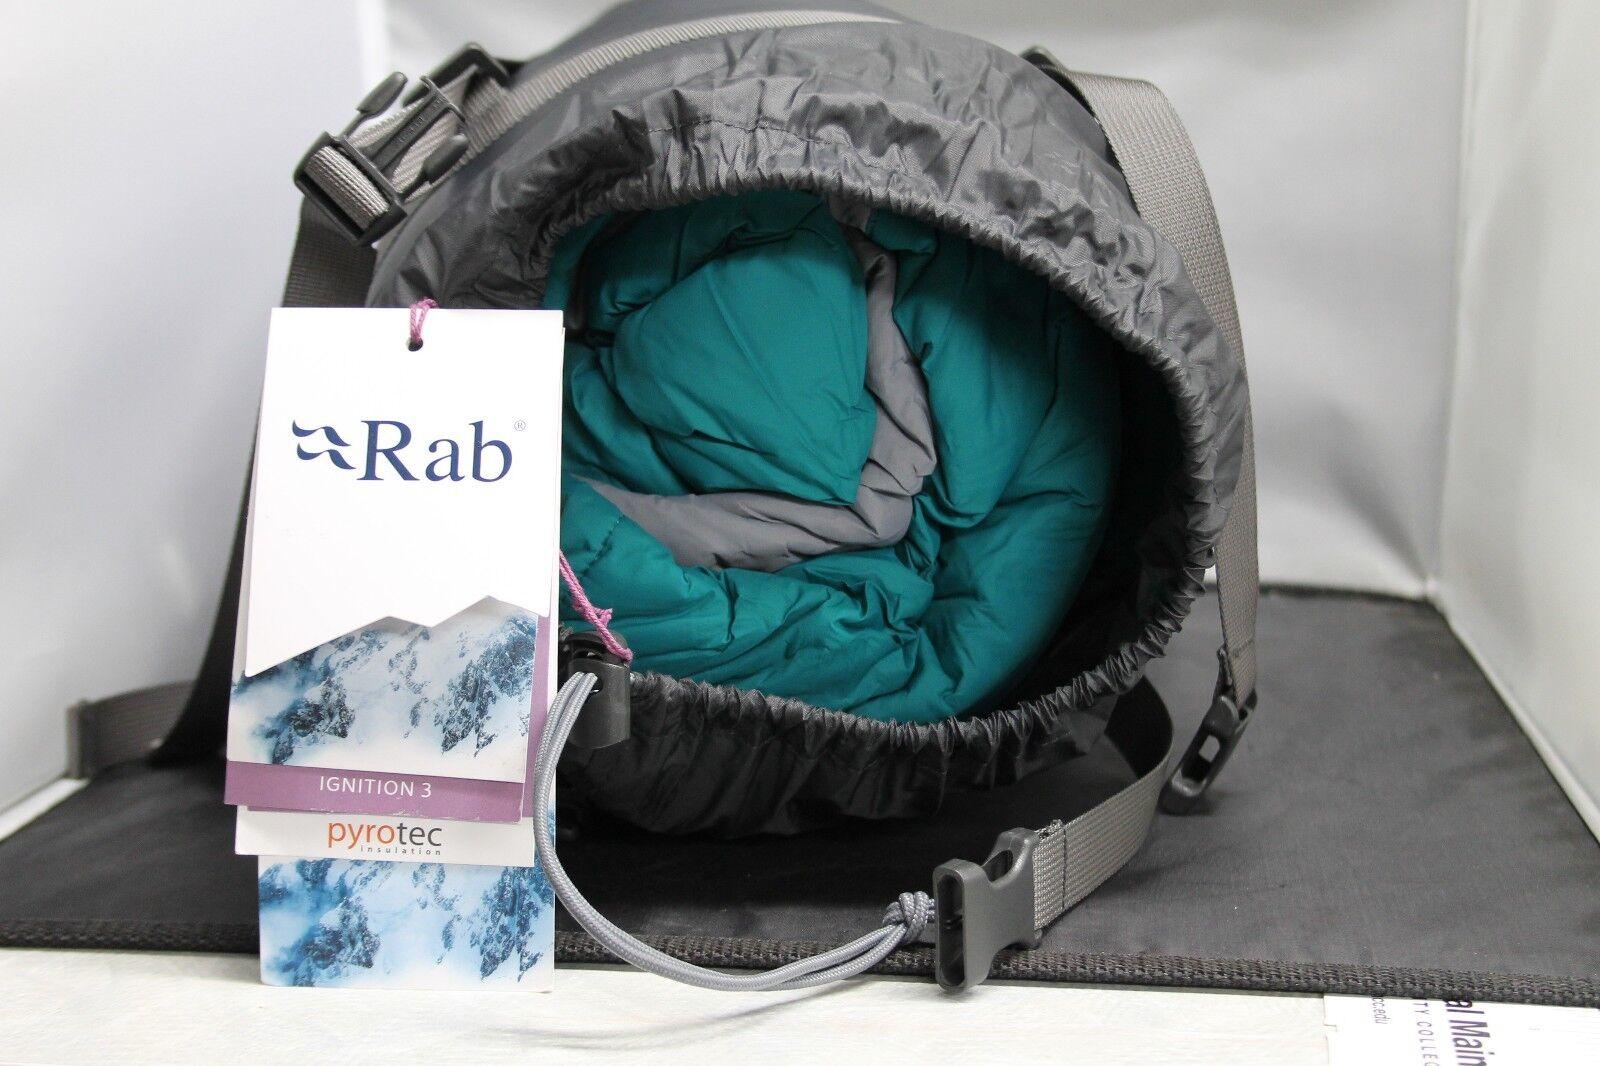 Rab Women's Ignition 3 Sleeping Bag BRAND NEW     2018 latest